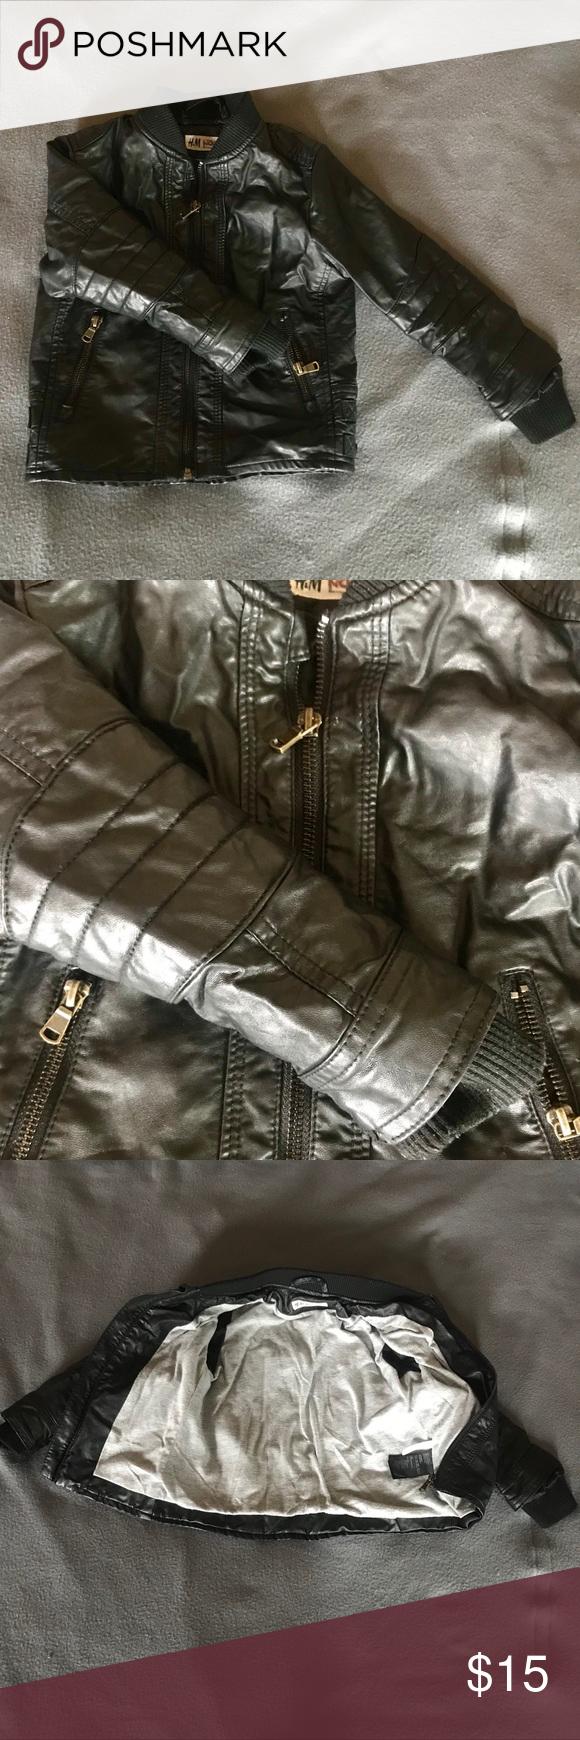 Toddler Boy Leather Jacket Sz 3 4 Boys Leather Jacket Leather Jacket Leather [ 1740 x 580 Pixel ]